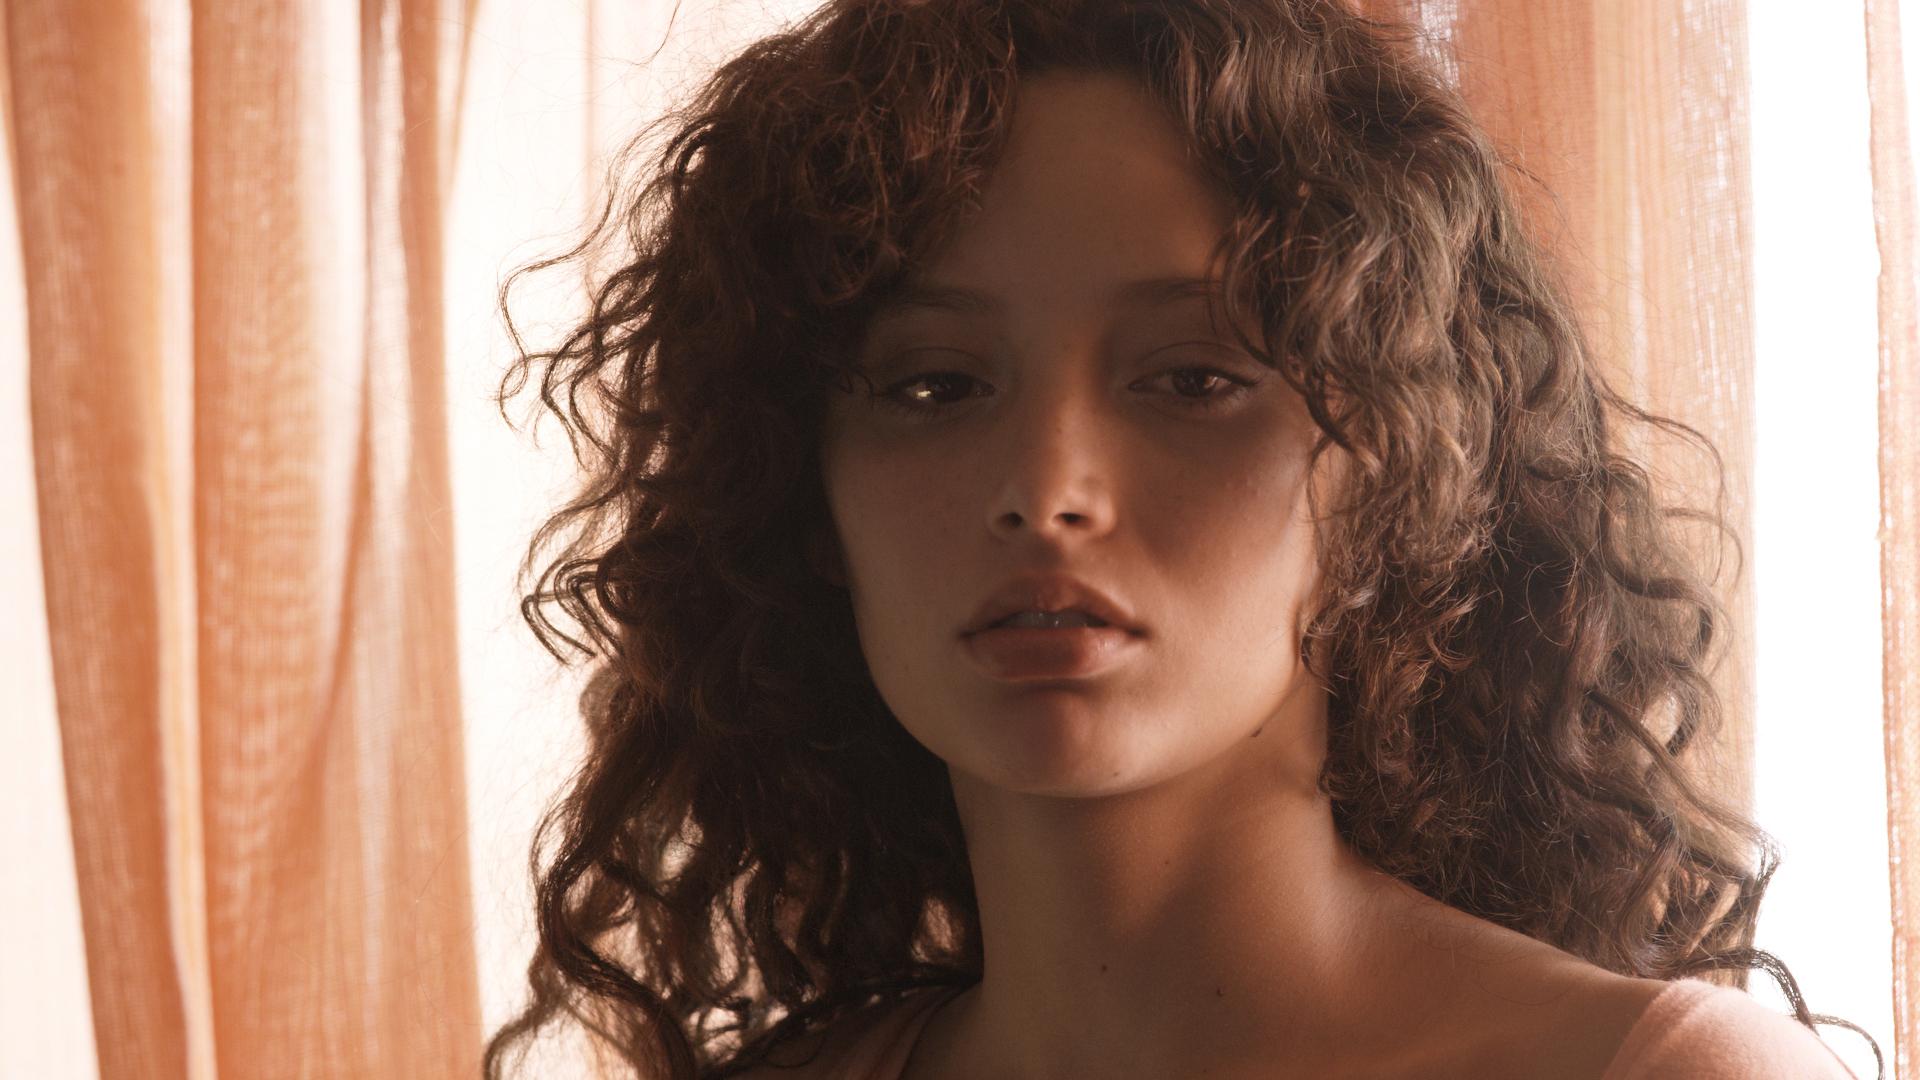 Ailin Salas Nude Photos 10